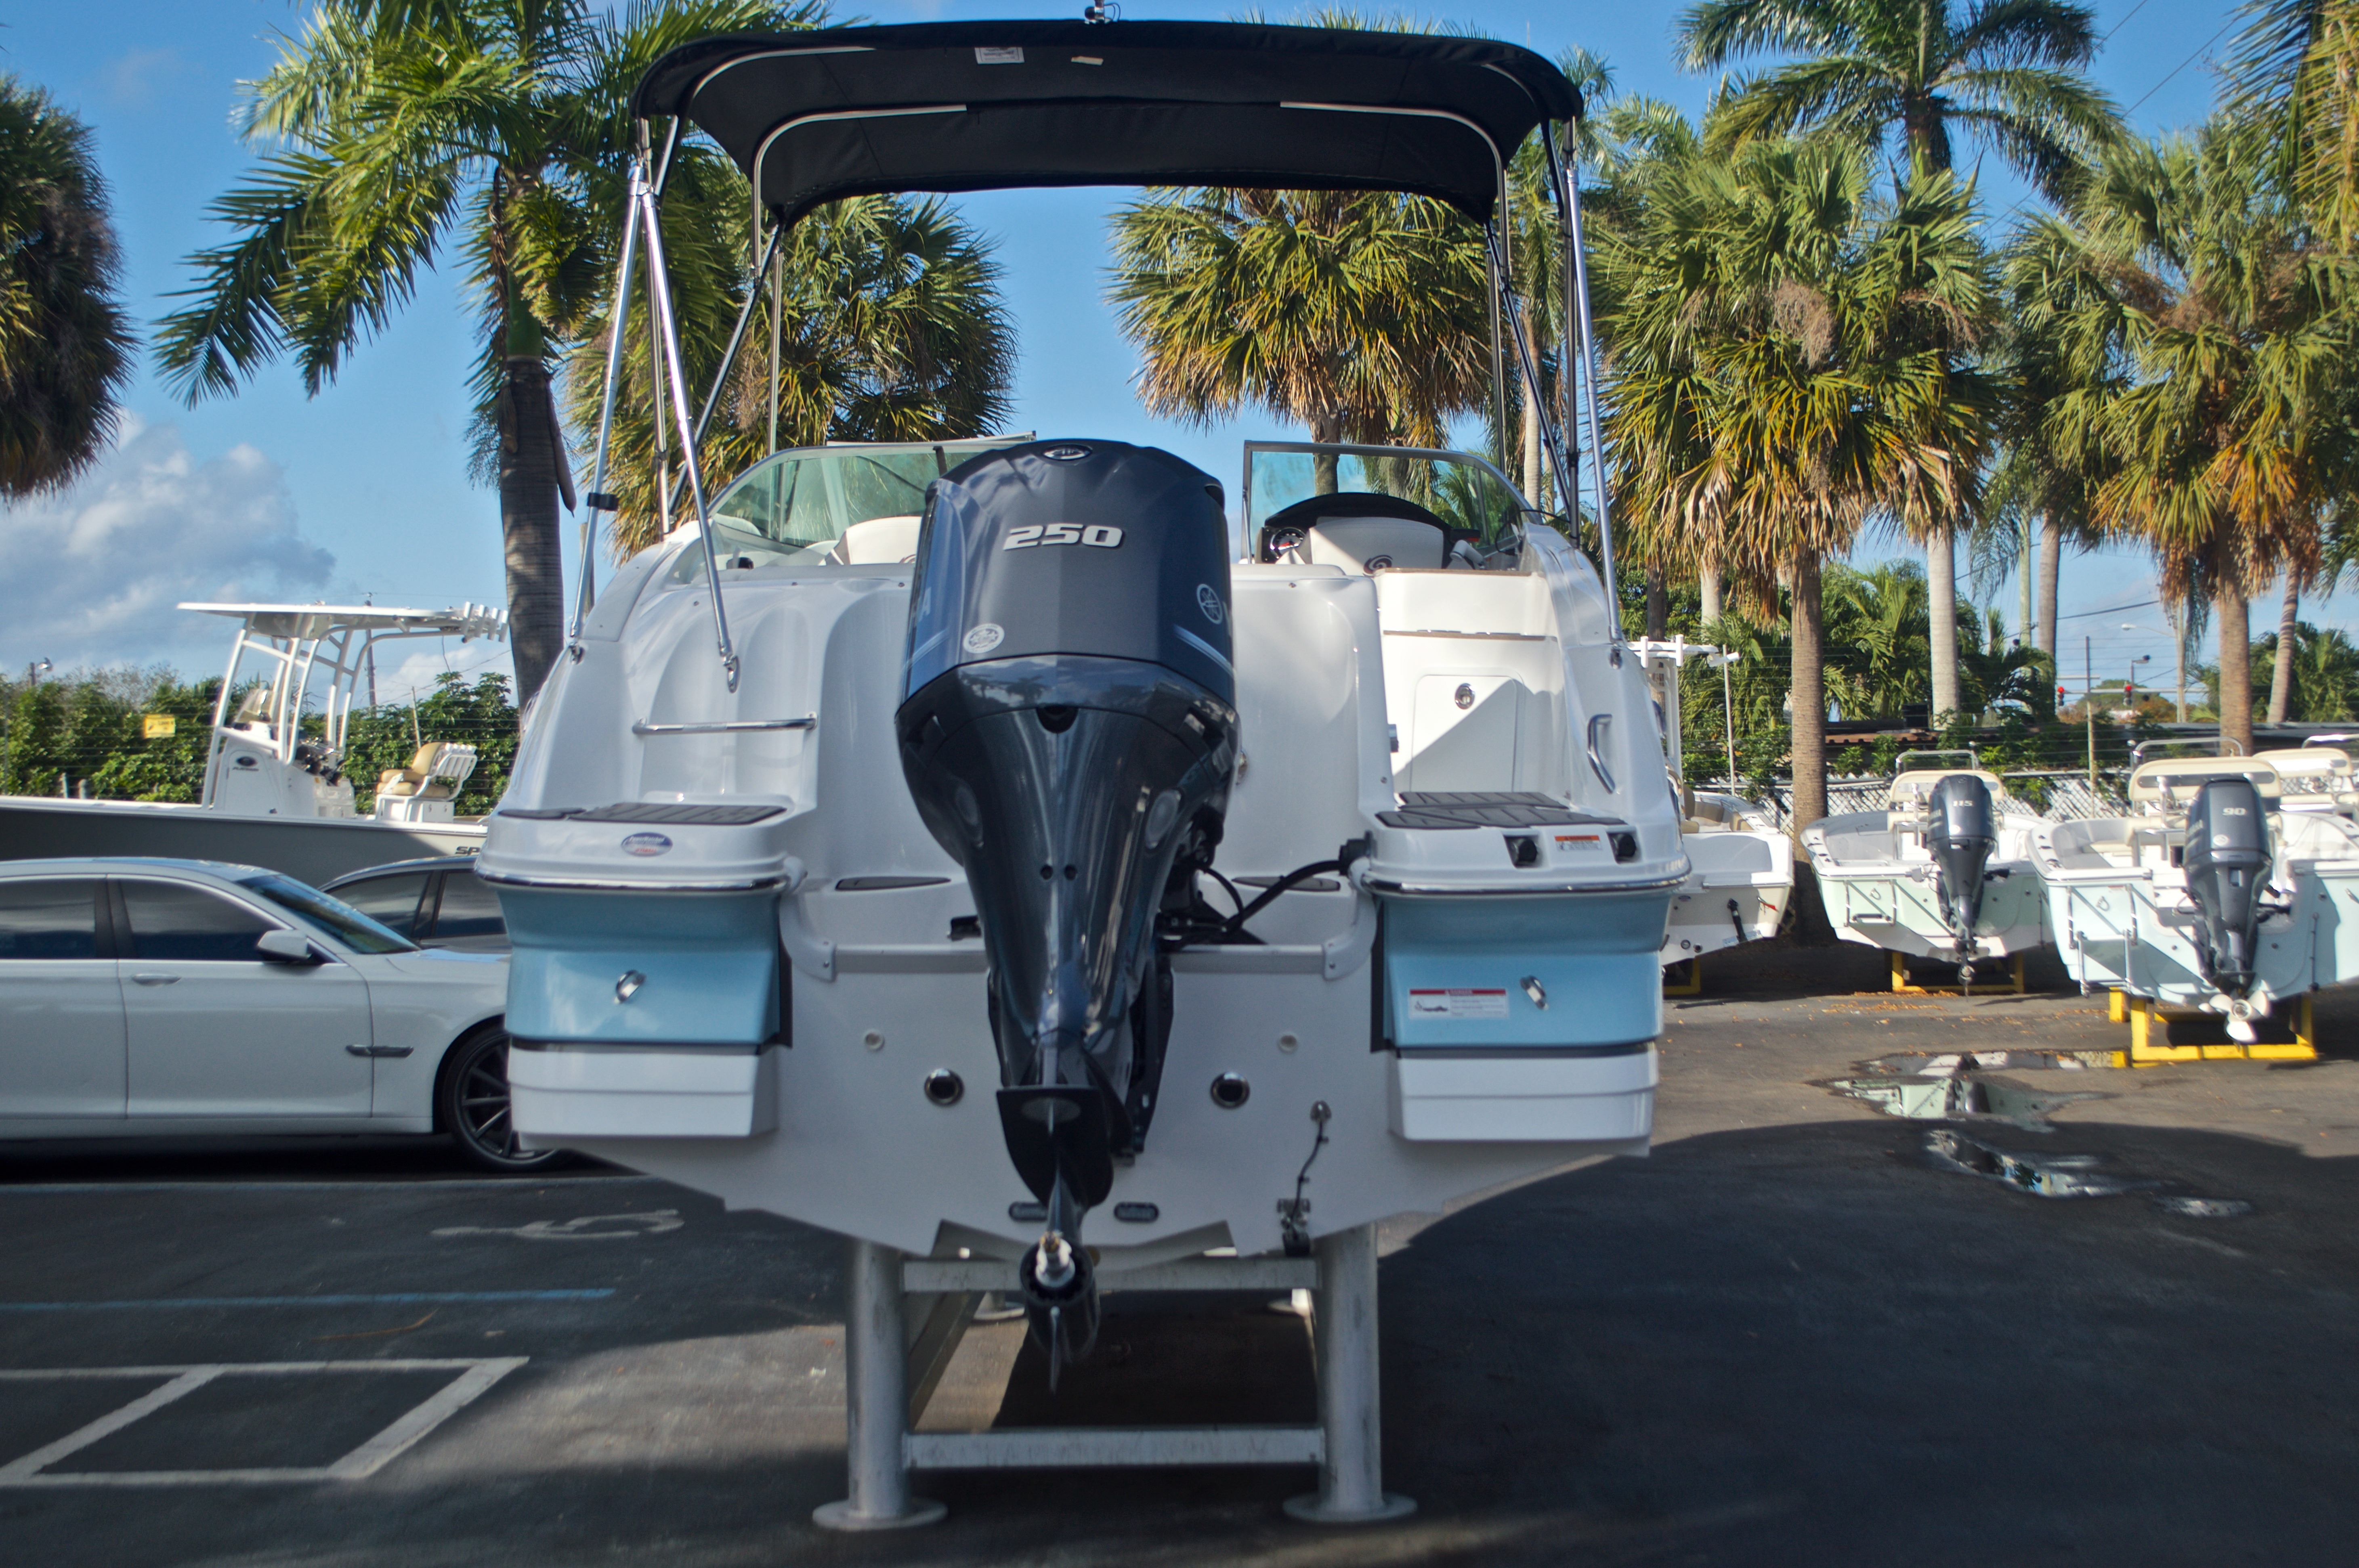 Thumbnail 7 for New 2017 Hurricane SunDeck SD 2400 OB boat for sale in Miami, FL